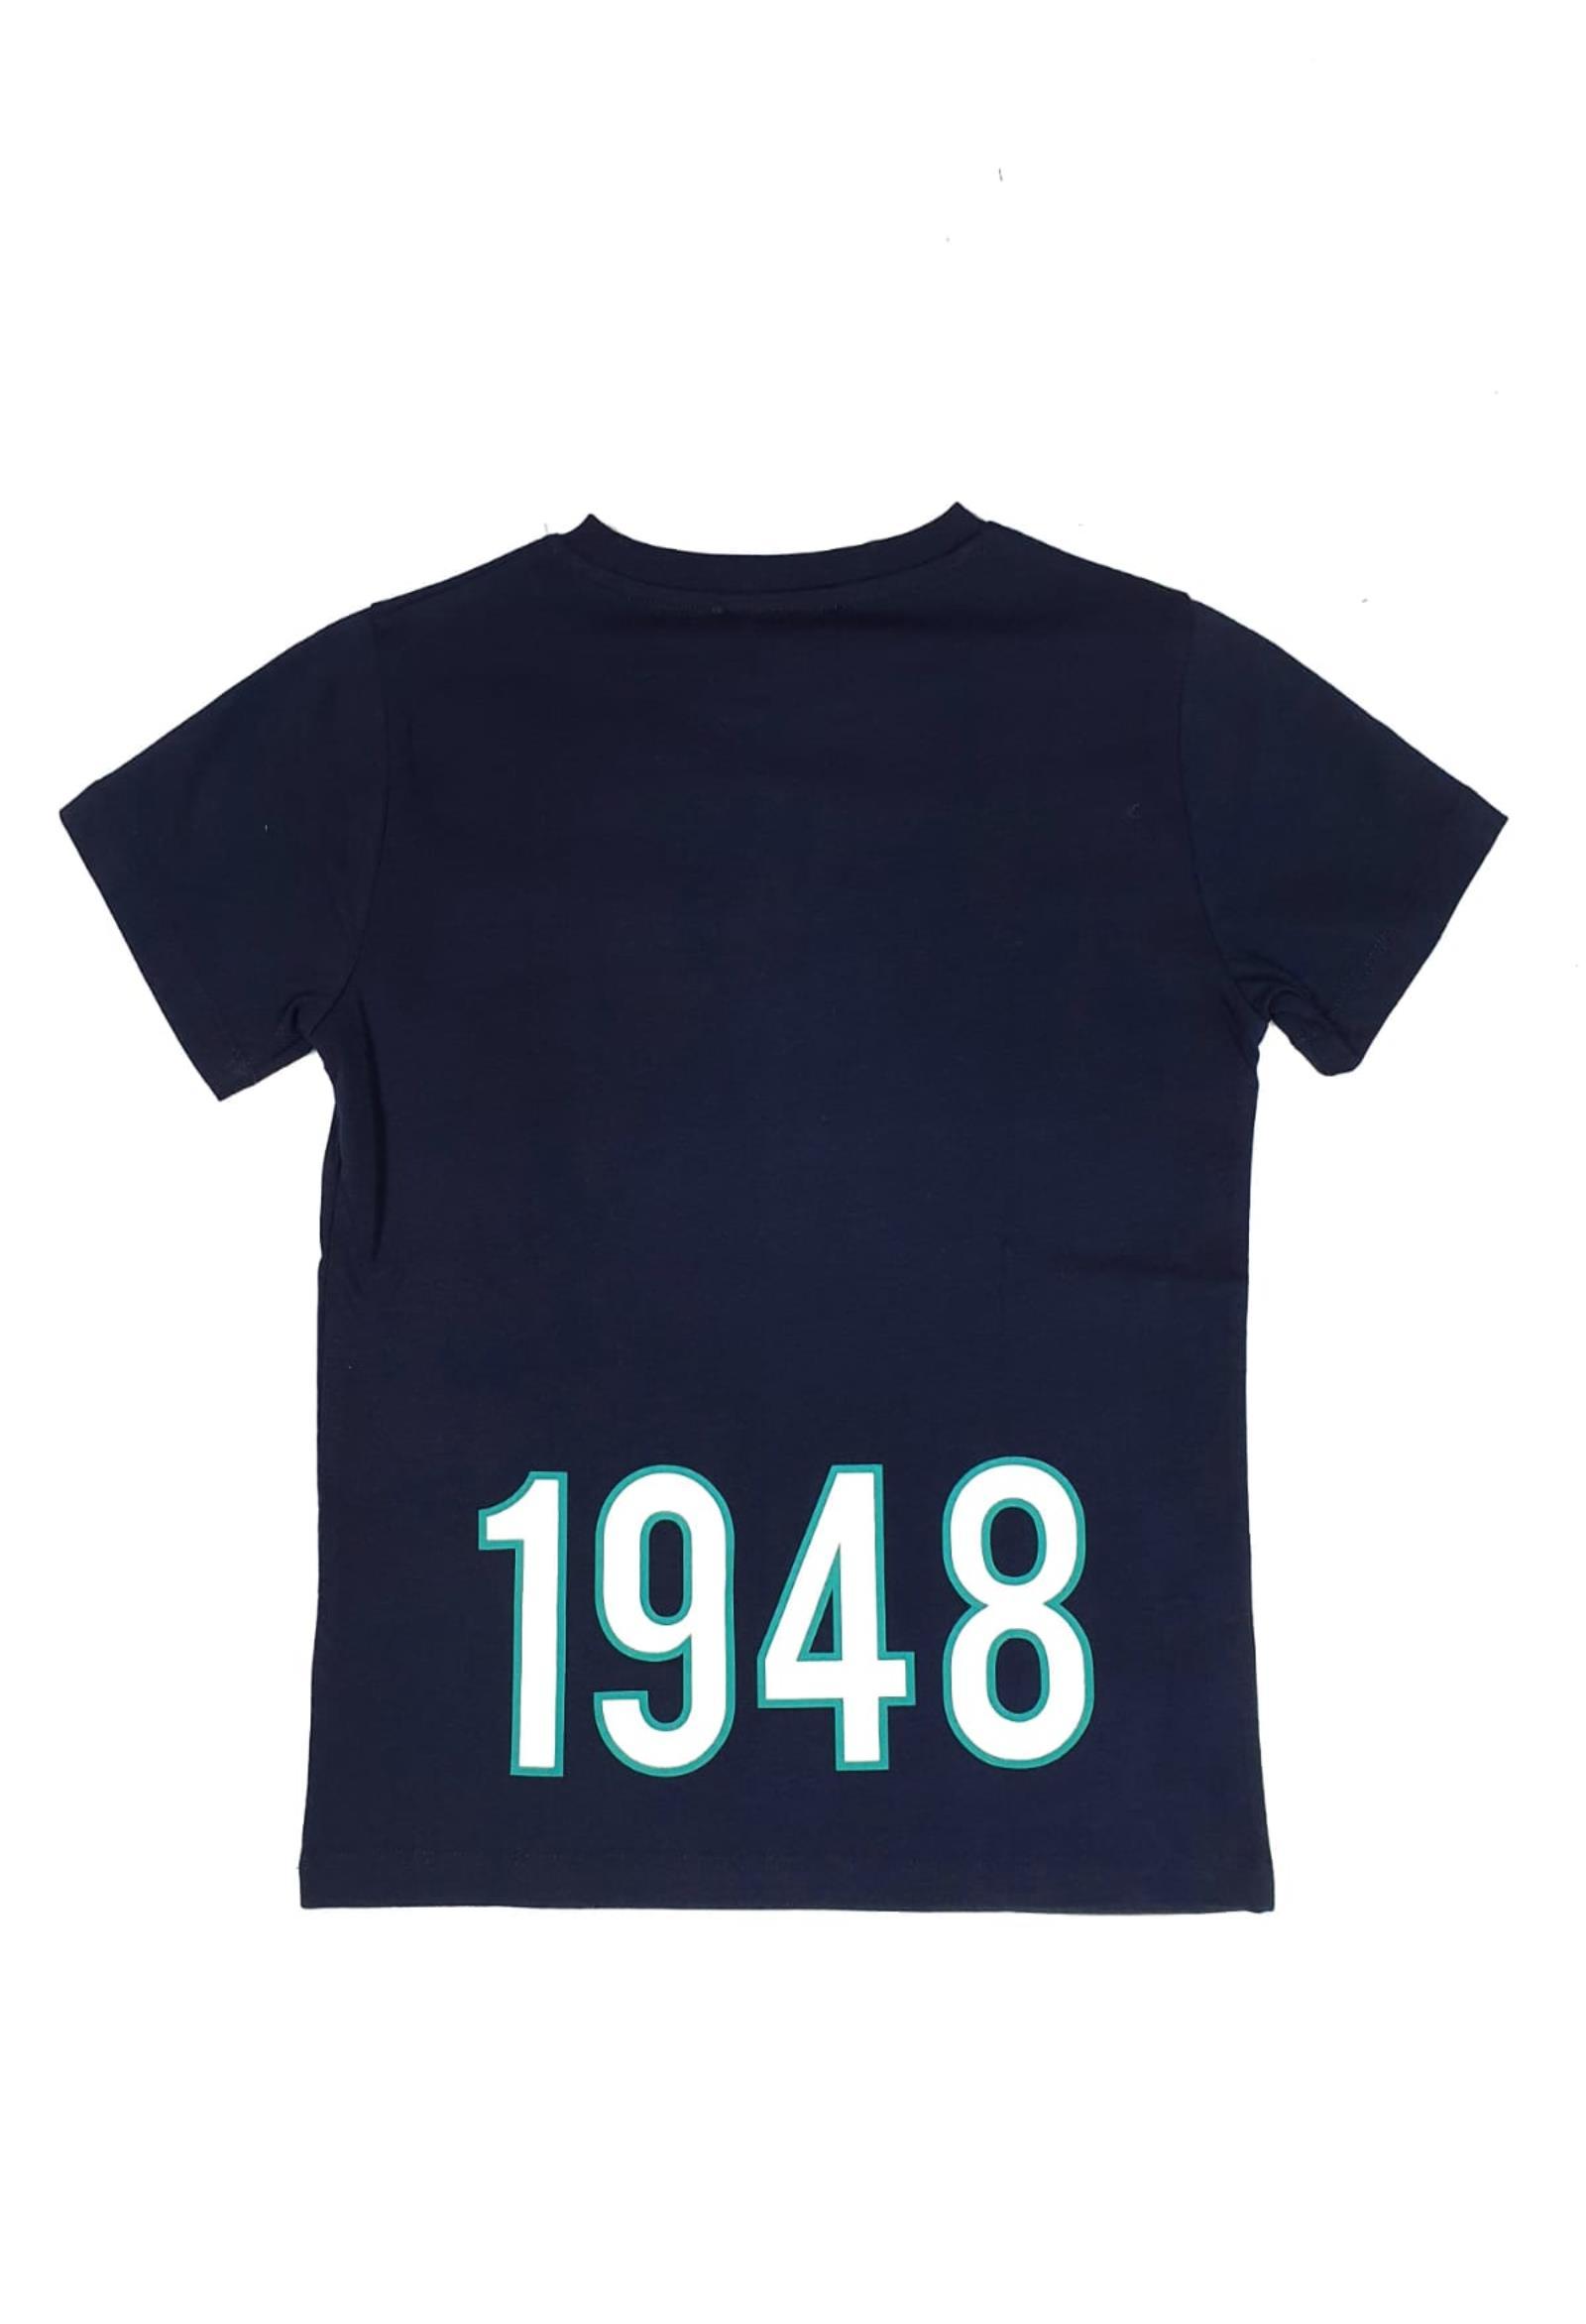 T-SHIRT BLU STAMPA POSTERIORE 1948 cesare paciotti   T-shirt   TSP1121JUNI